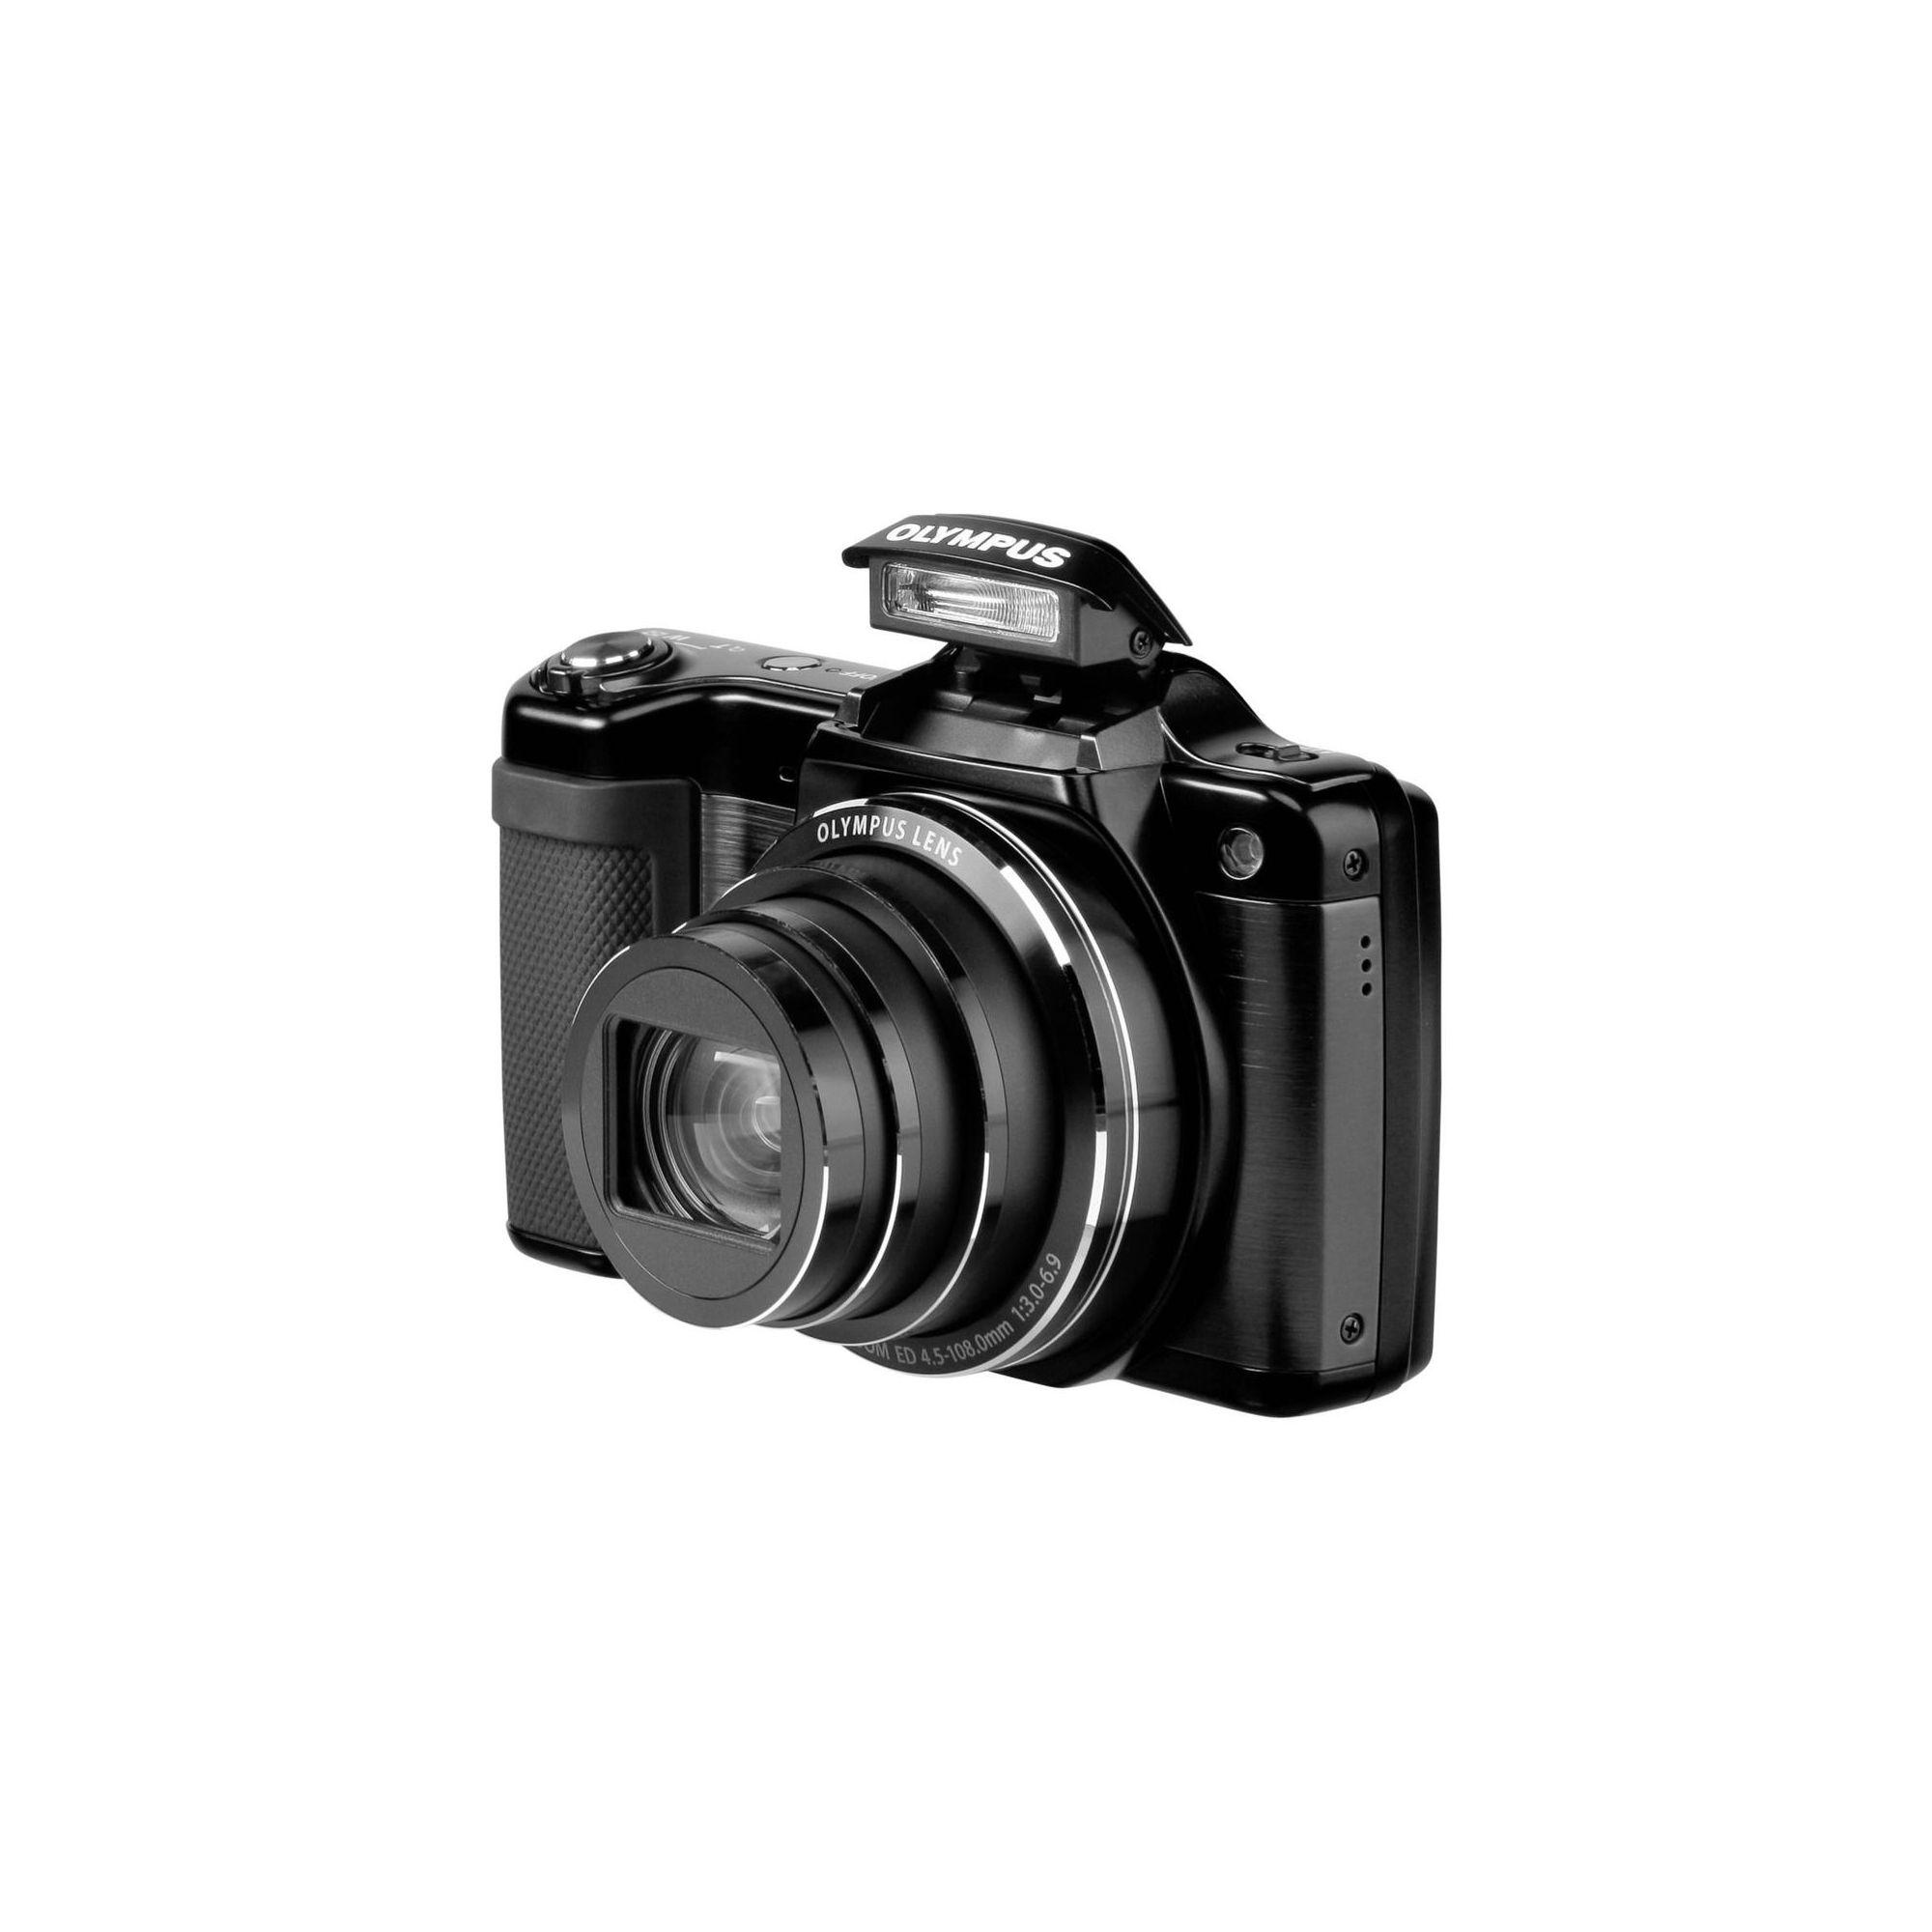 Olympus SZ-15 Compact Digital Camera in Black